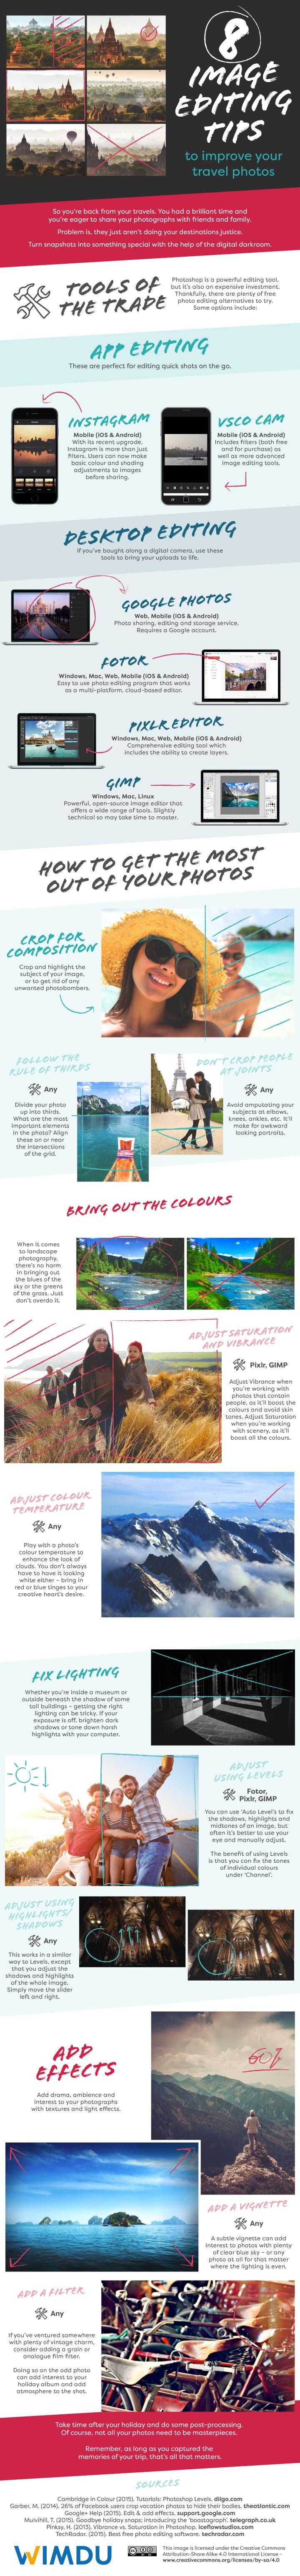 edit travel photo infographic